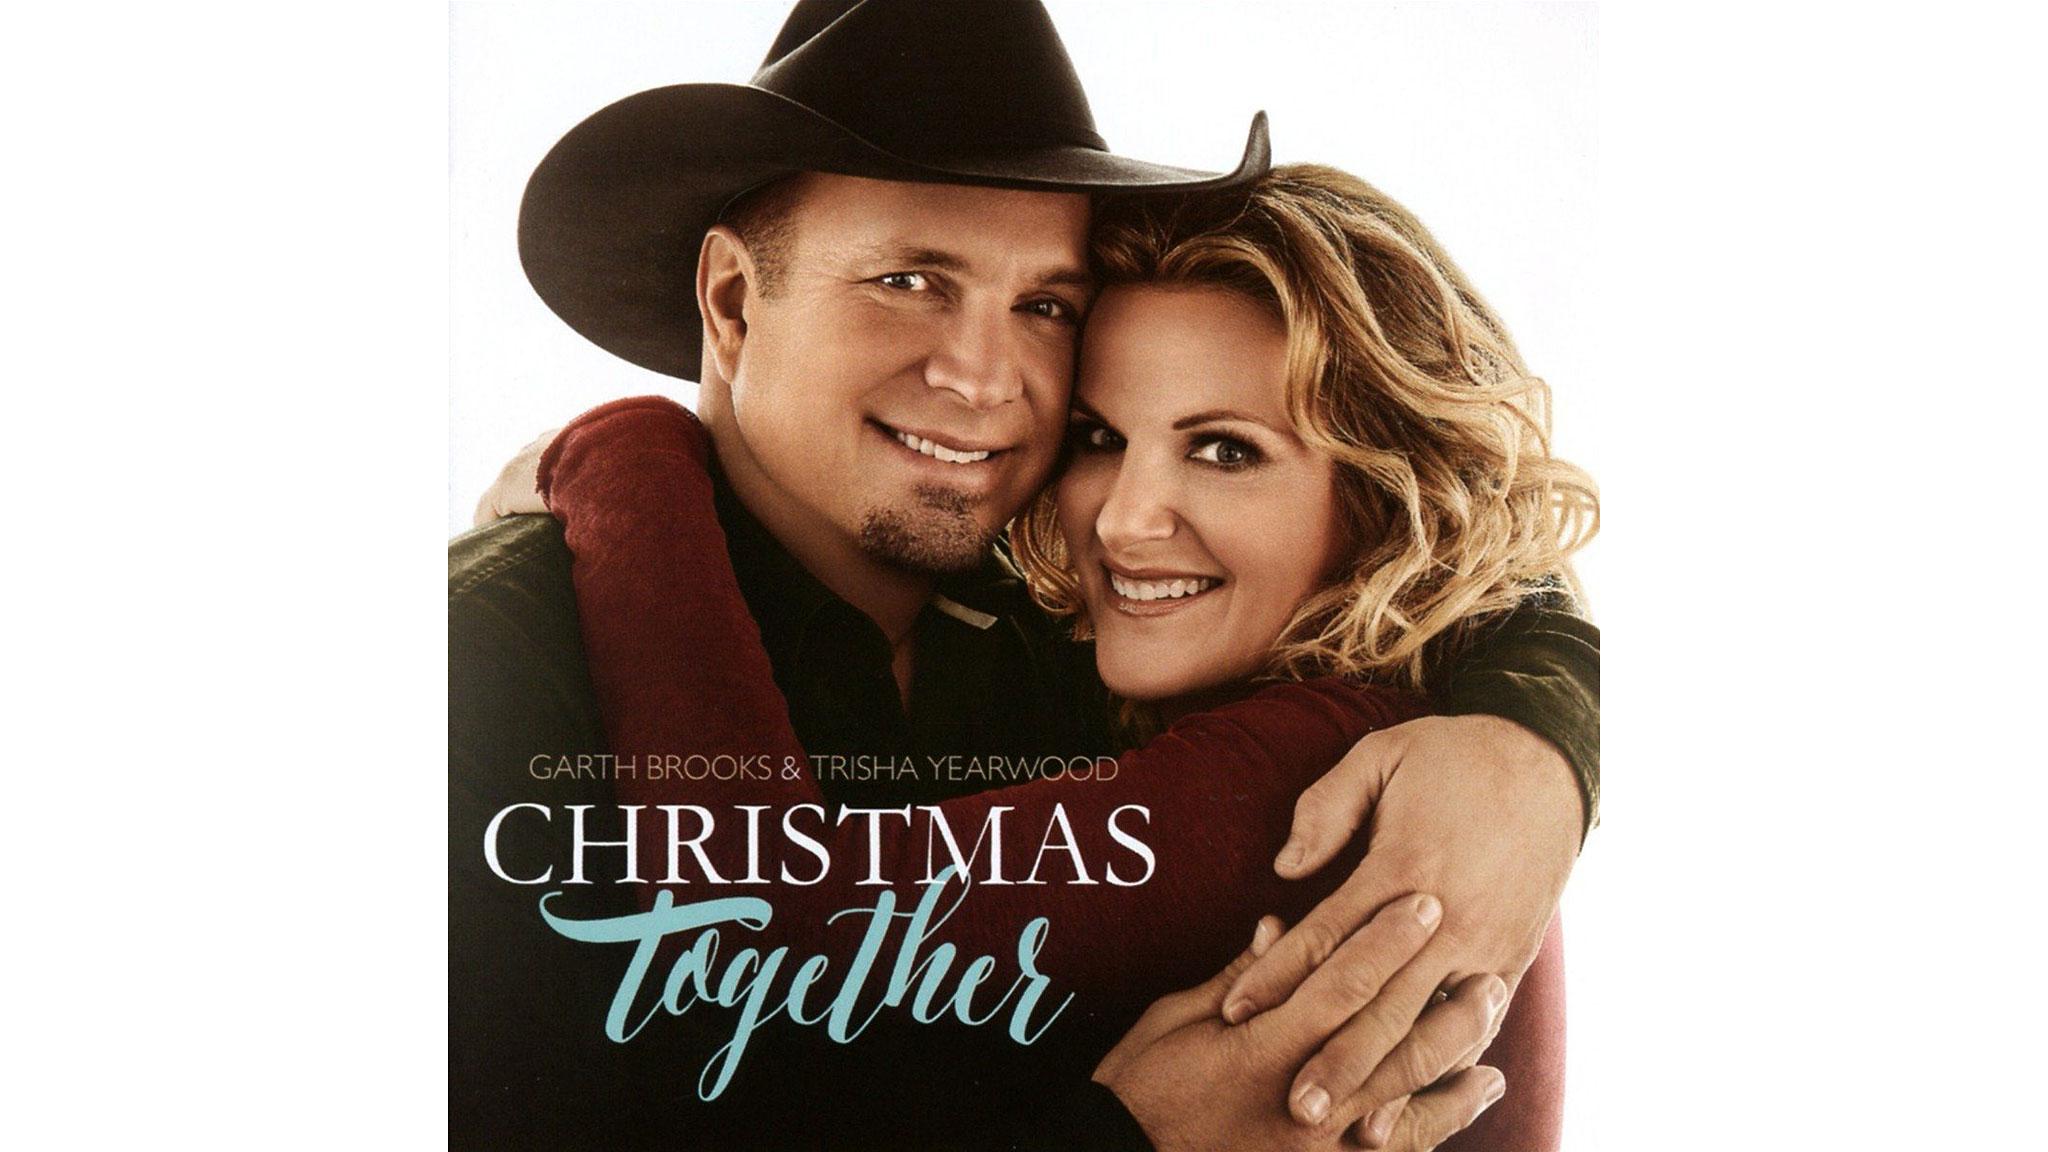 Garth And Trisha Christmas Album 2020 Garth Brooks & Trisha Yearwood: Christmas Together — review